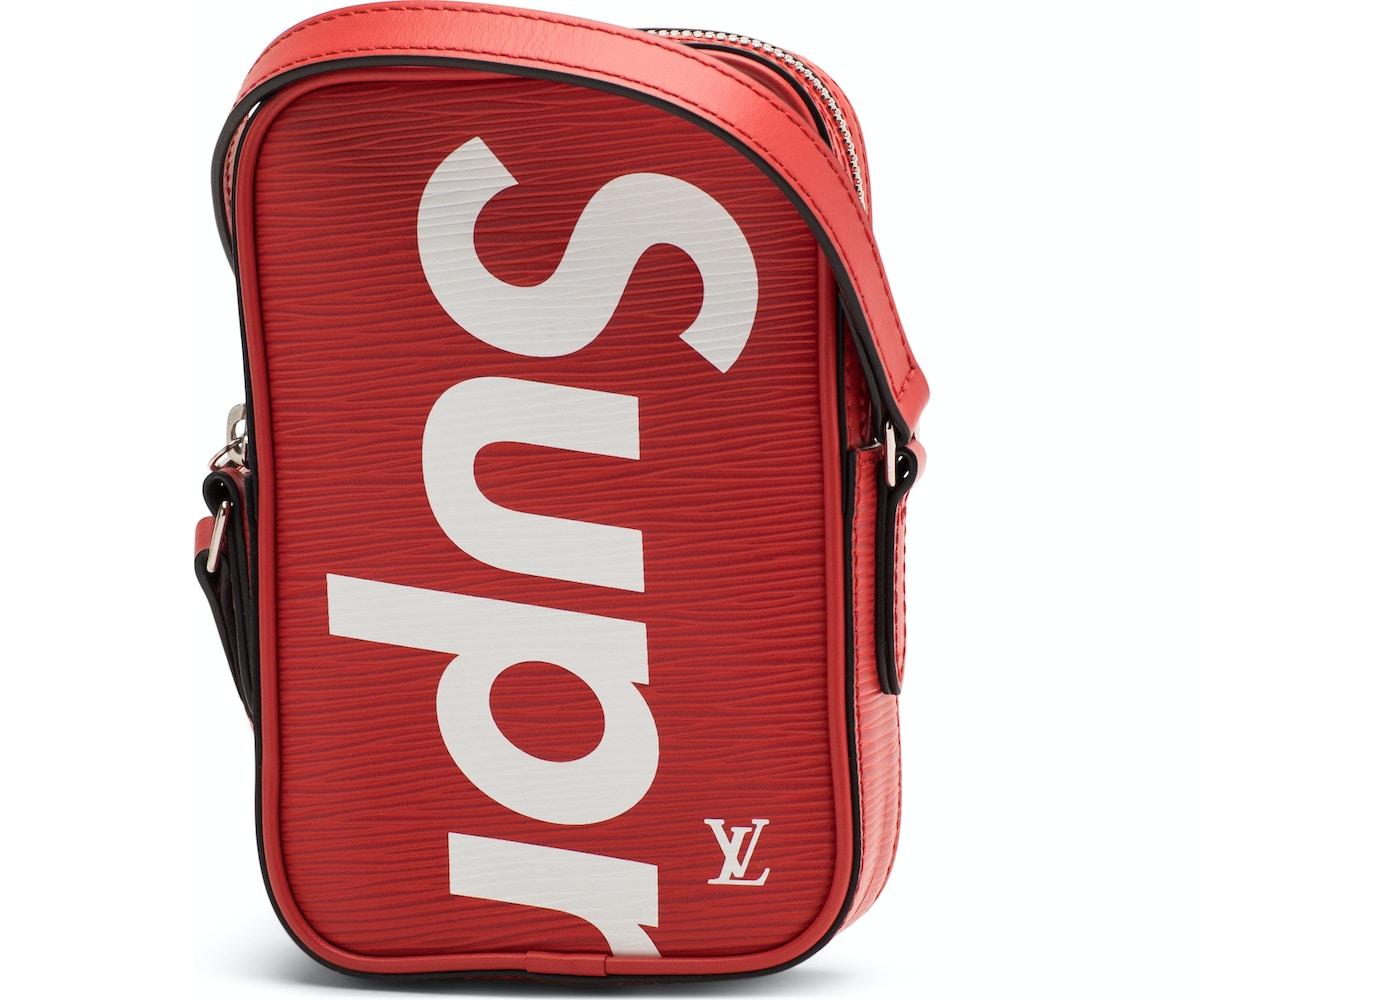 80765b45e472 Buy   Sell Louis Vuitton Supreme Handbags - Highest Bid